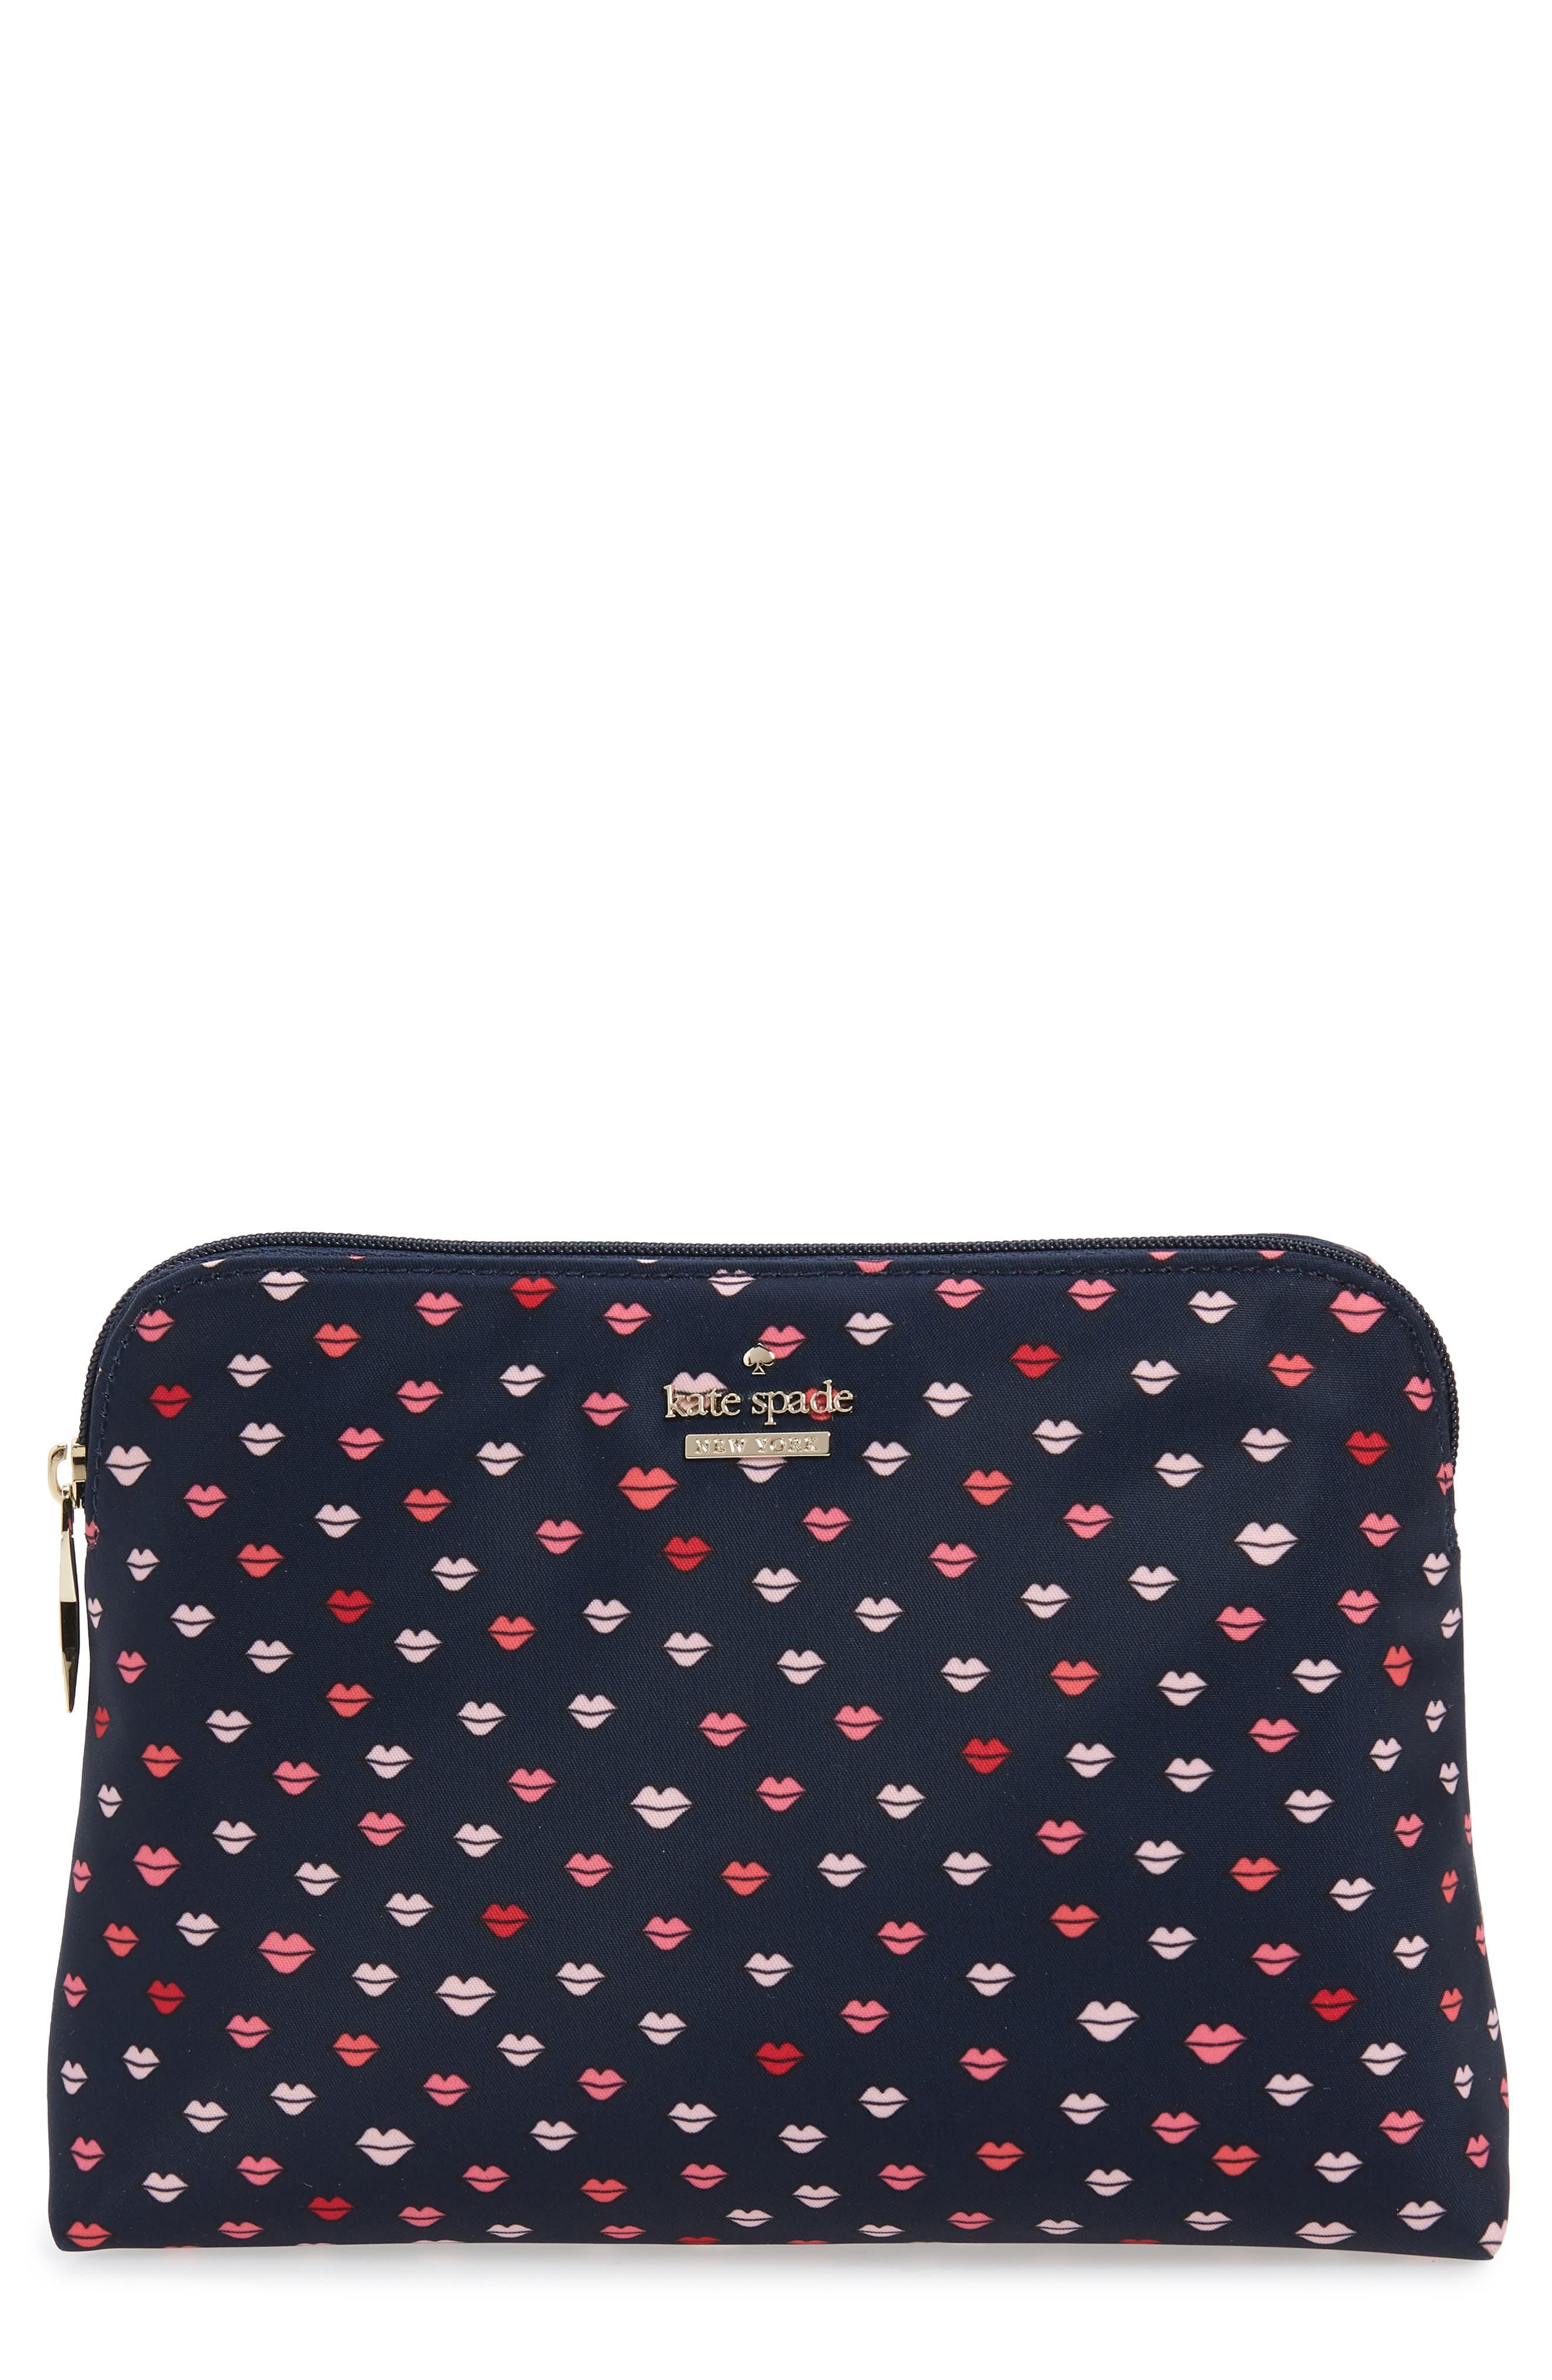 KATE SPADE NEW YORK watson lane small briley cosmetic bag, Main, color, NAVY MULTI